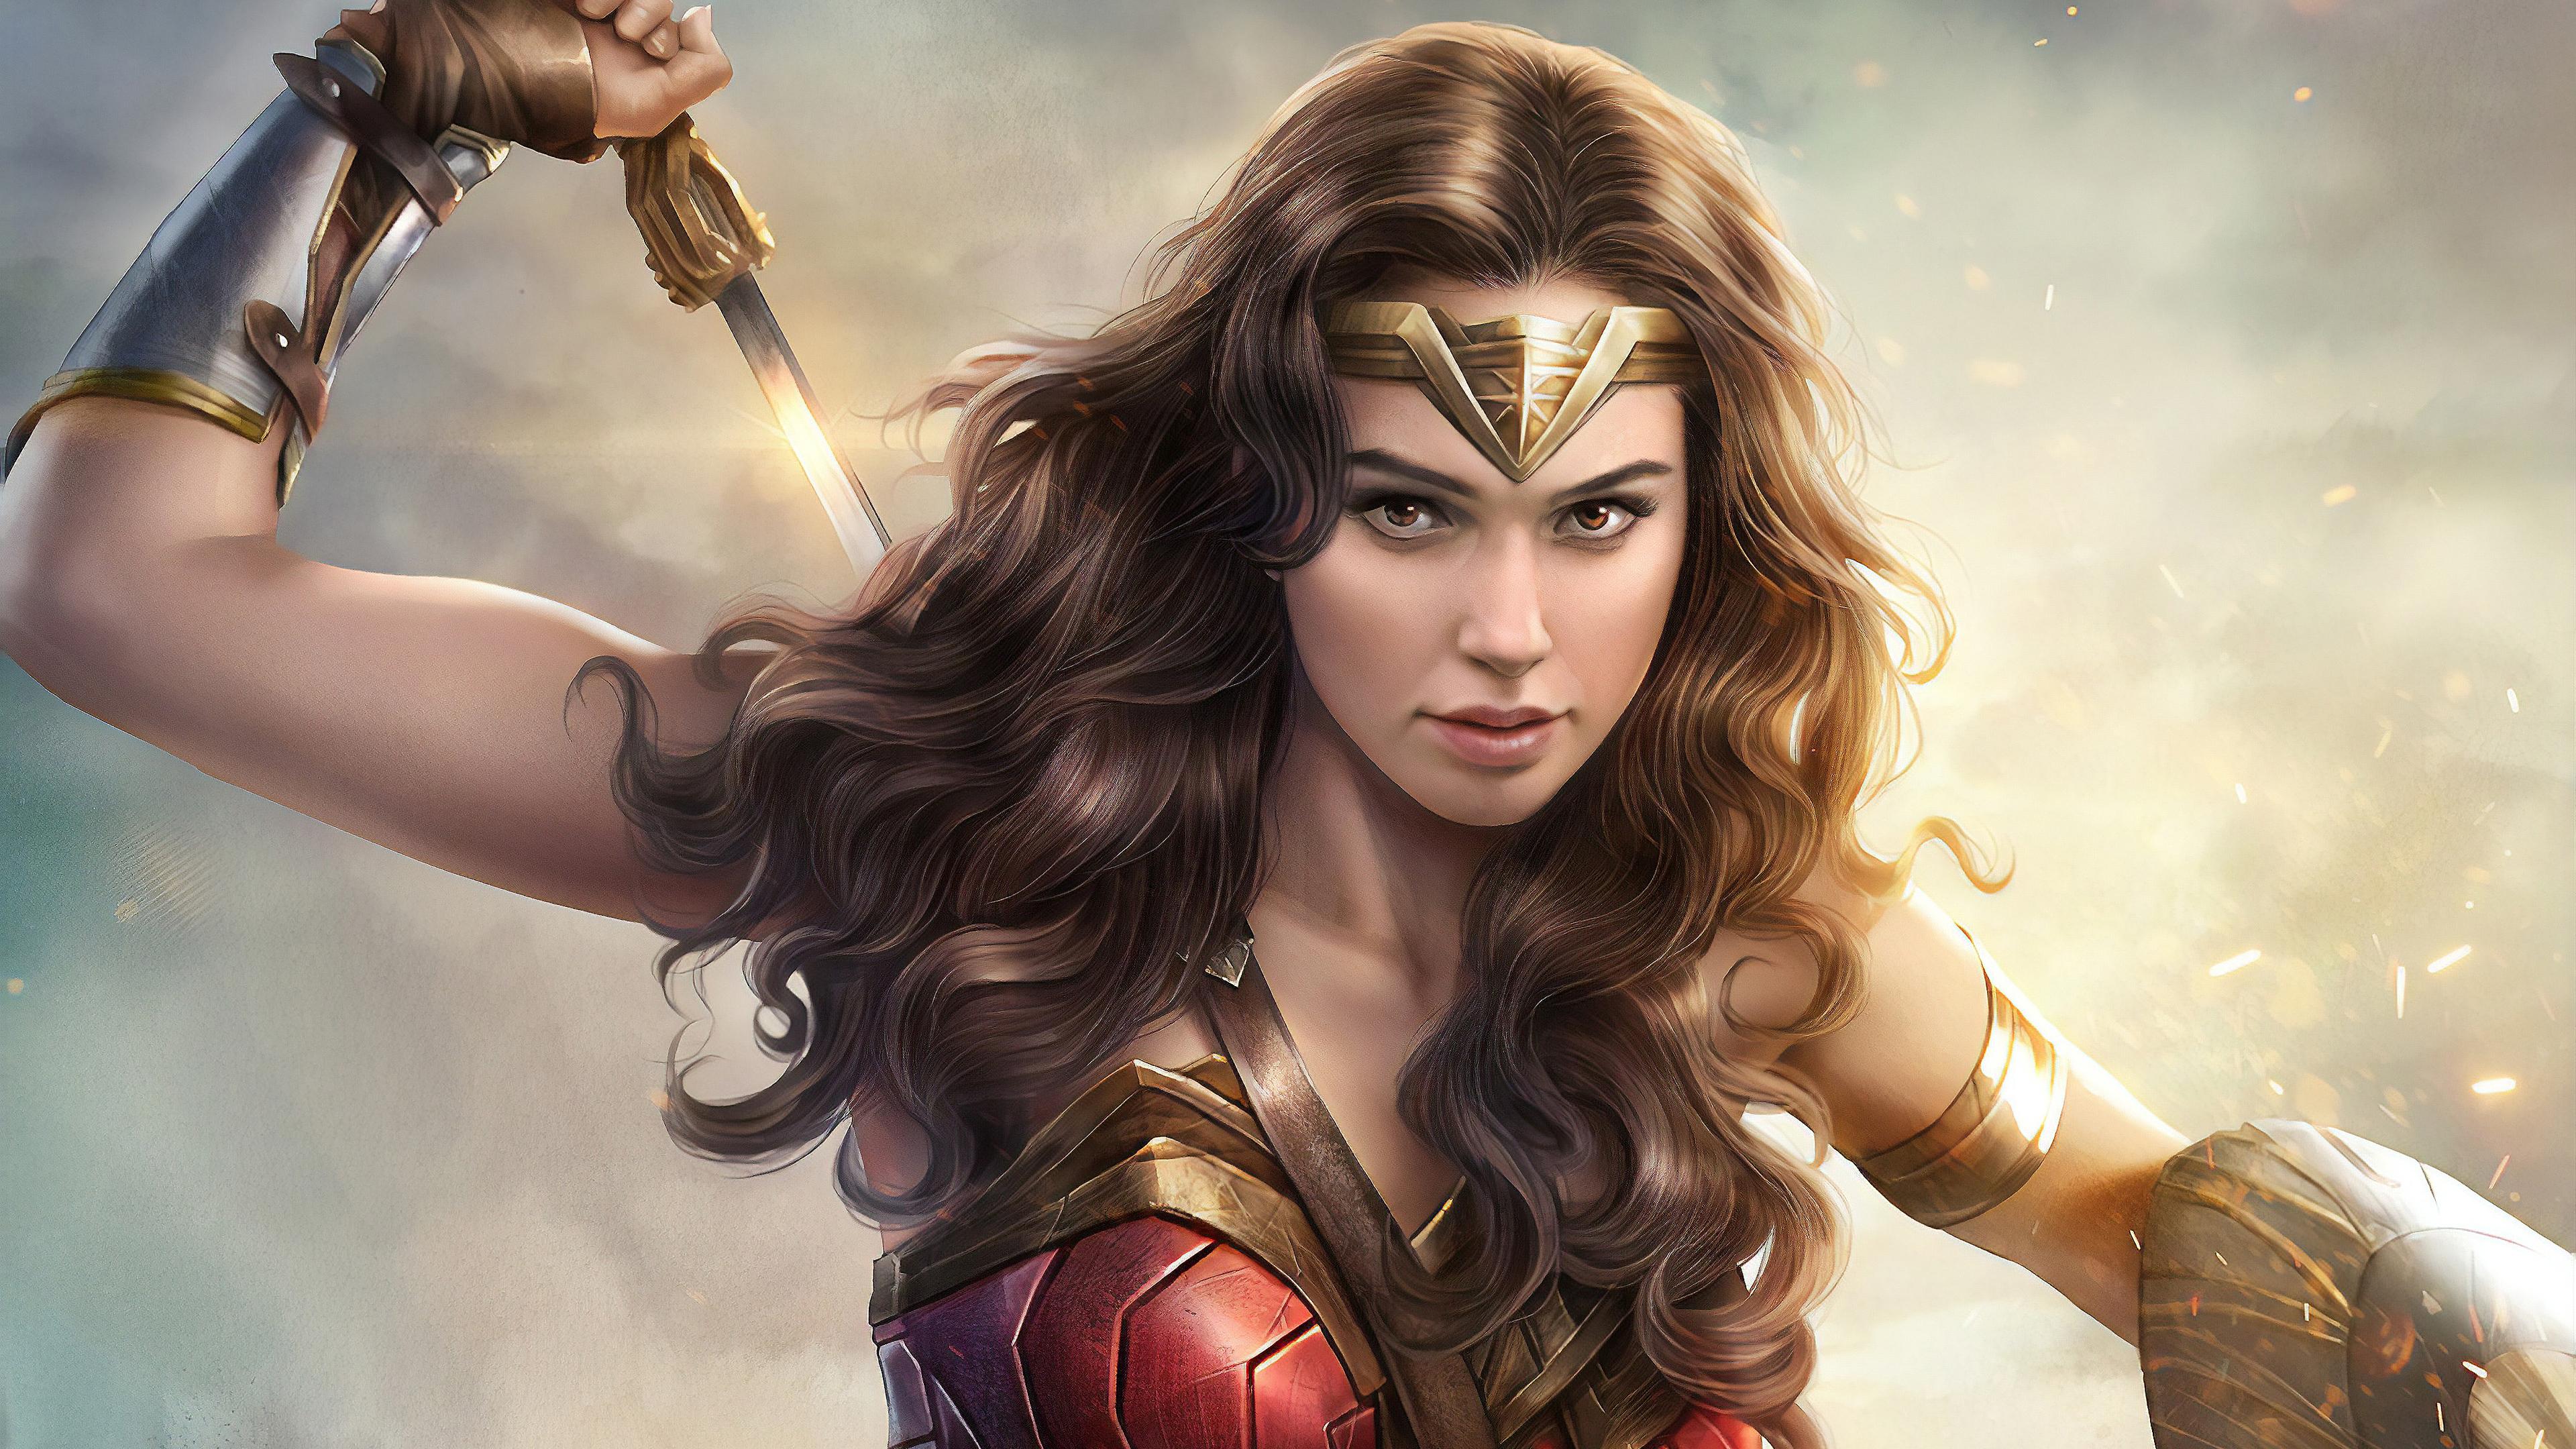 Wallpaper 4k 4k Gal Gadot Wonder Woman 4k Wallpapers Artist